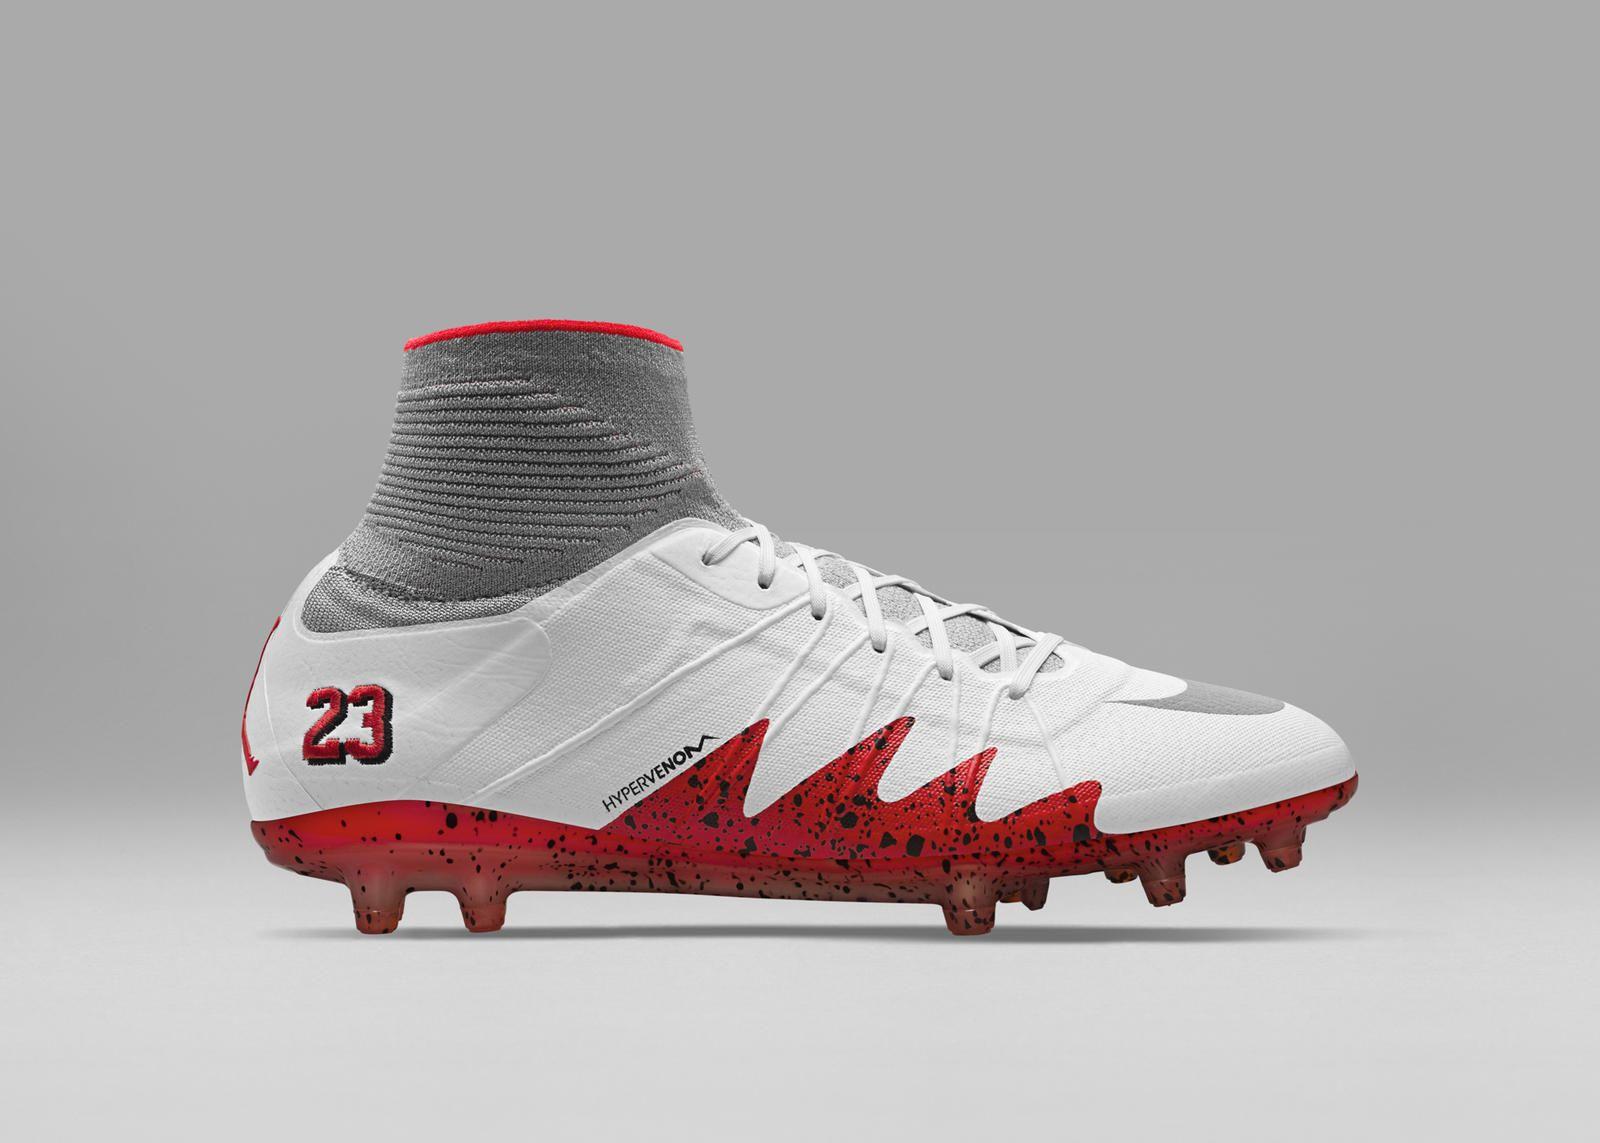 86fc55ac93 NJR x JORDAN COLLECTION | Football boots | Football boots, Jordans ...